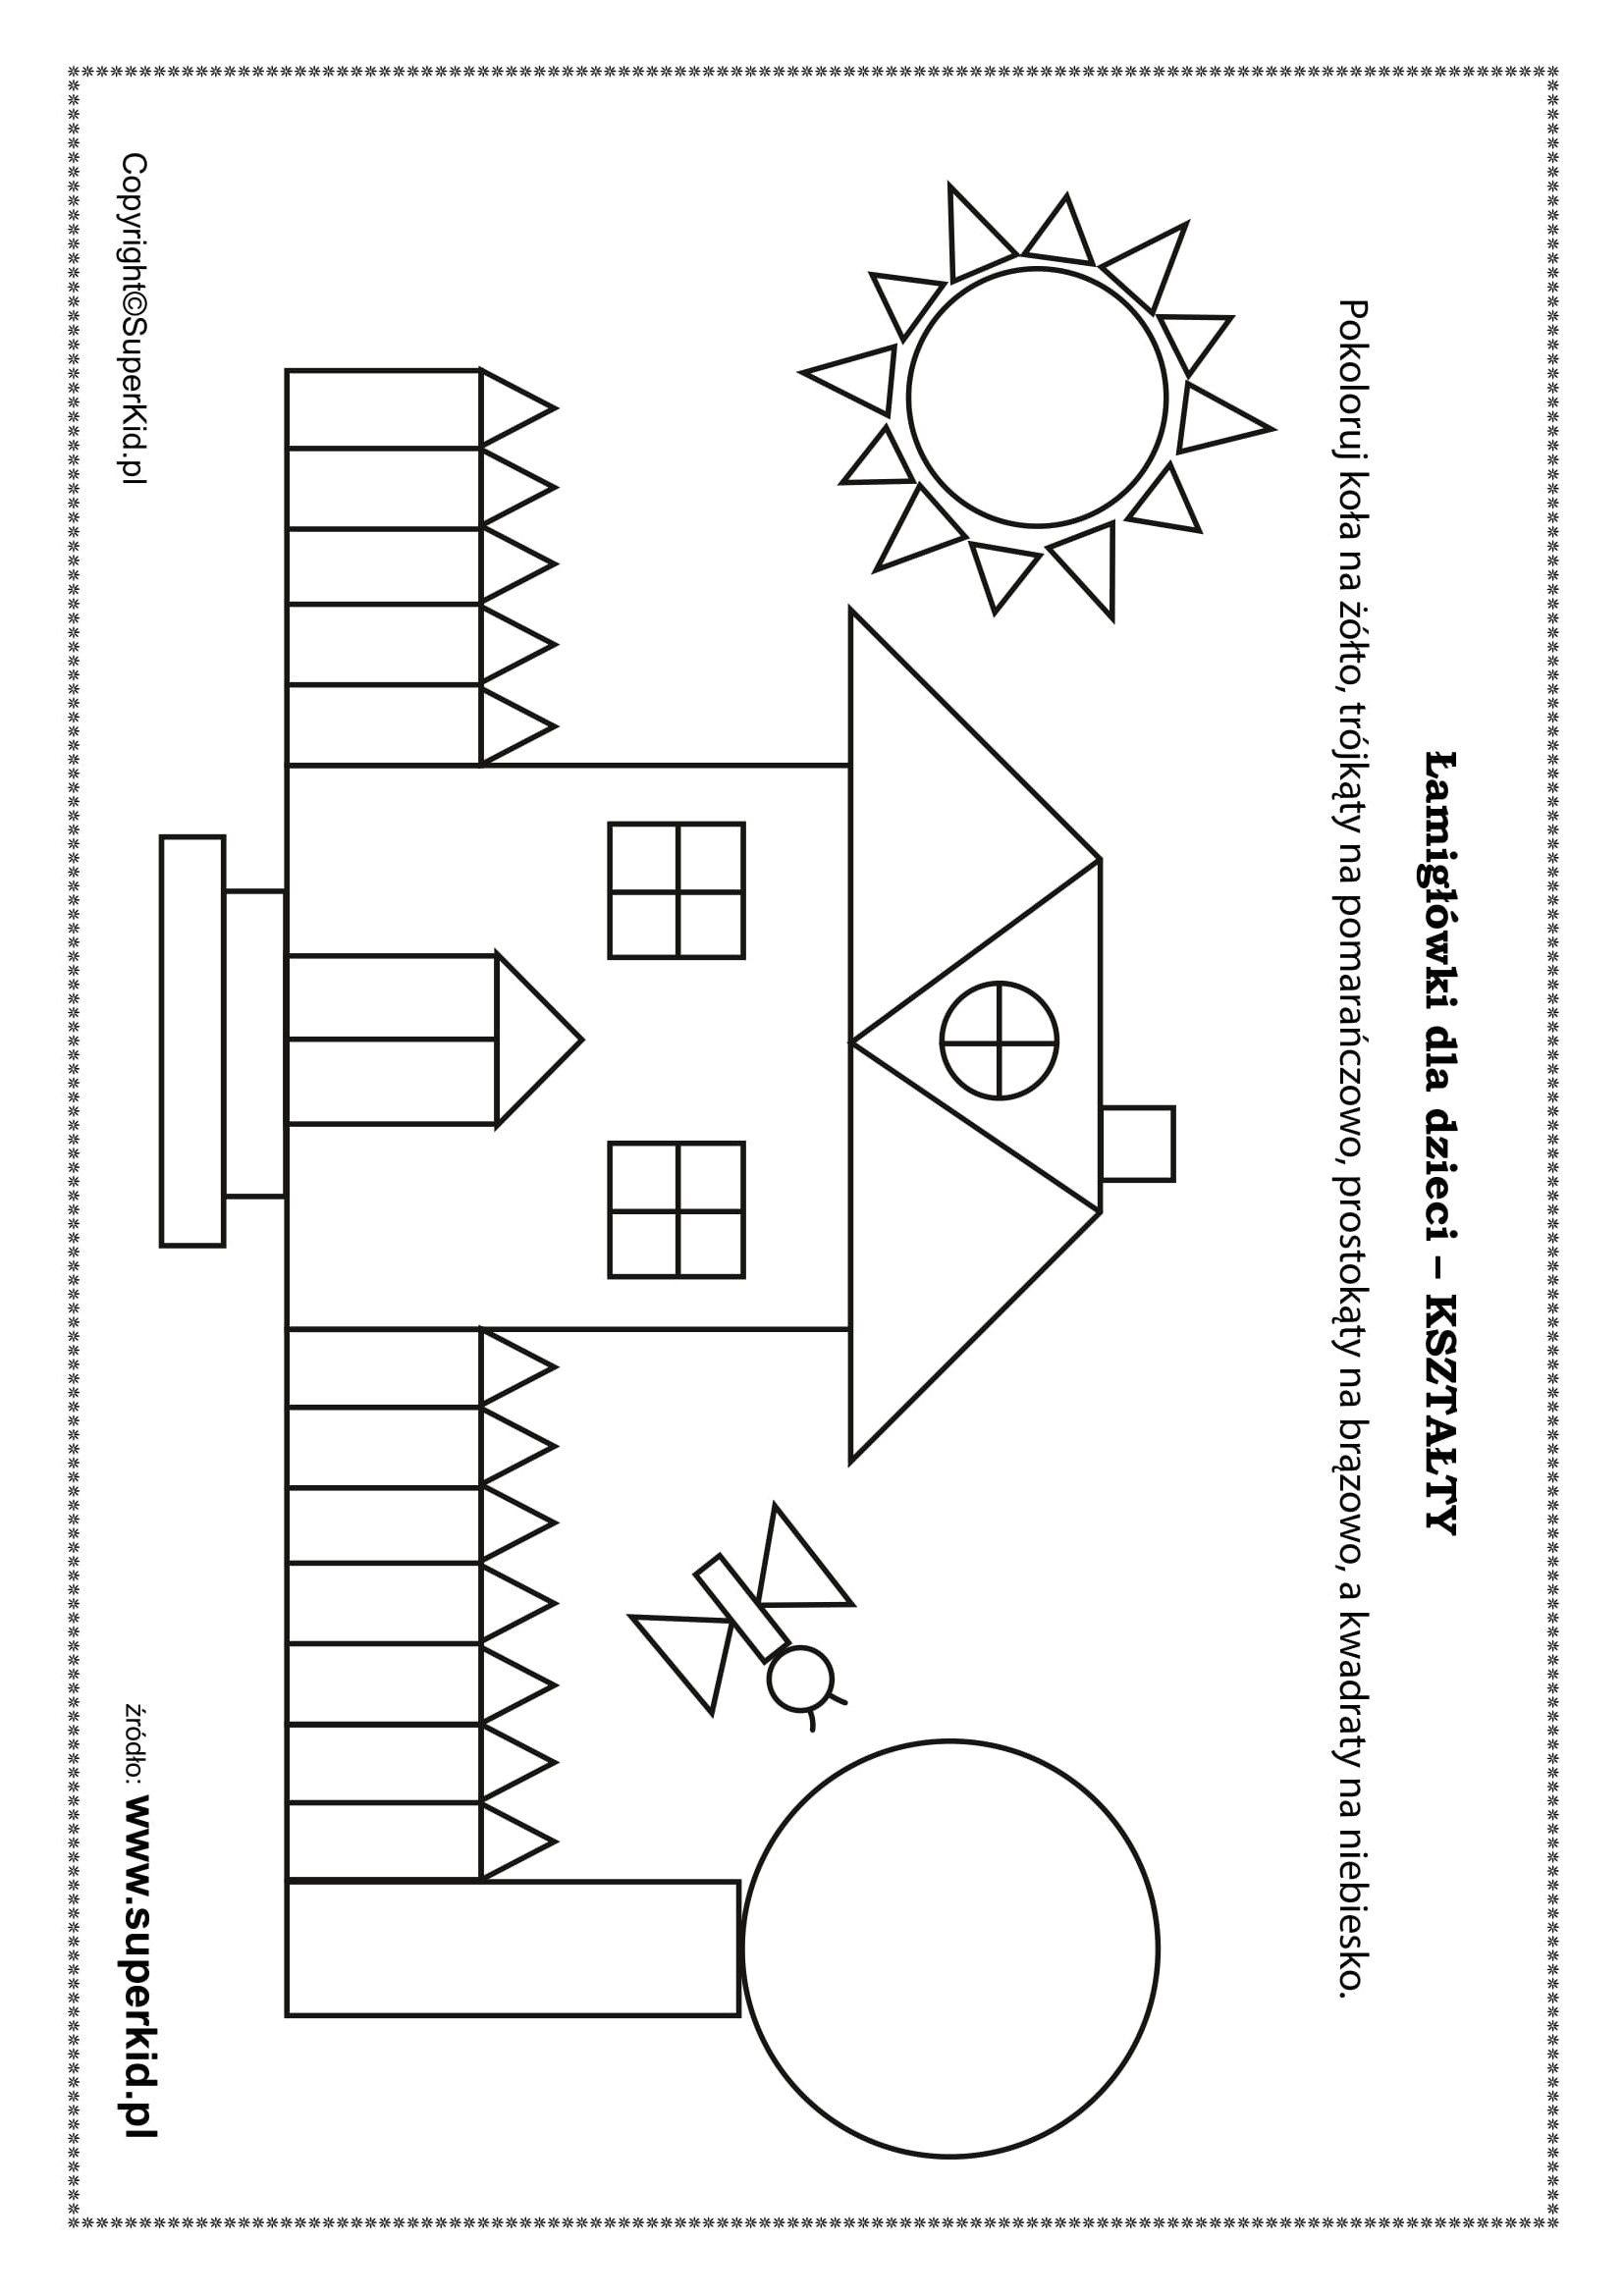 Pin By Gocha On Gocha In 2020 Alphabet Preschool Alphabet Coloring Pages Kindergarden